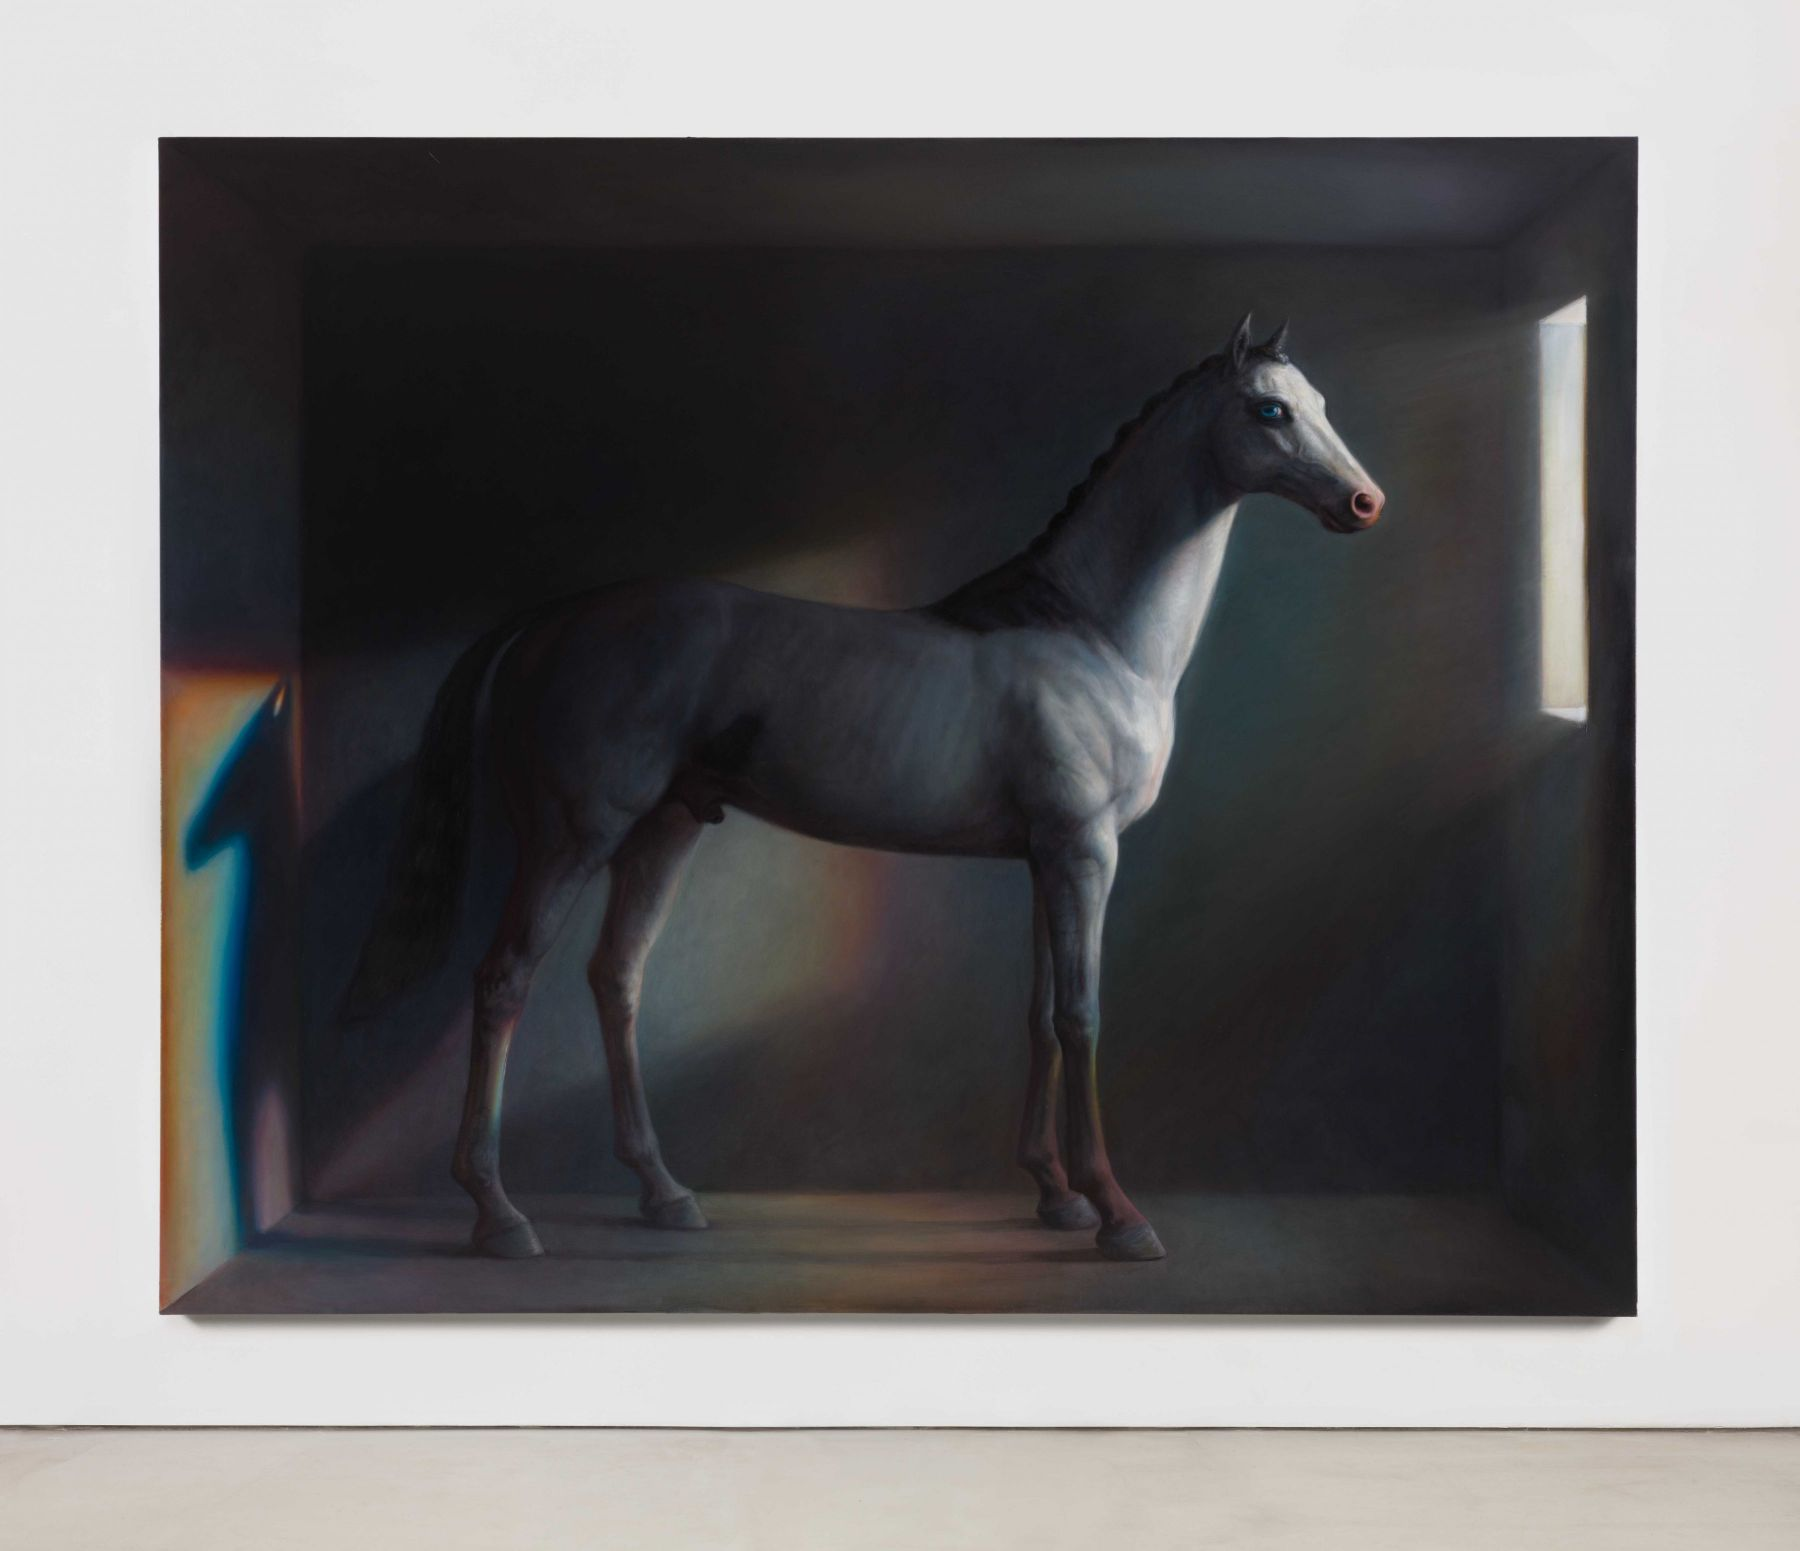 TM Davy, Horse (x)